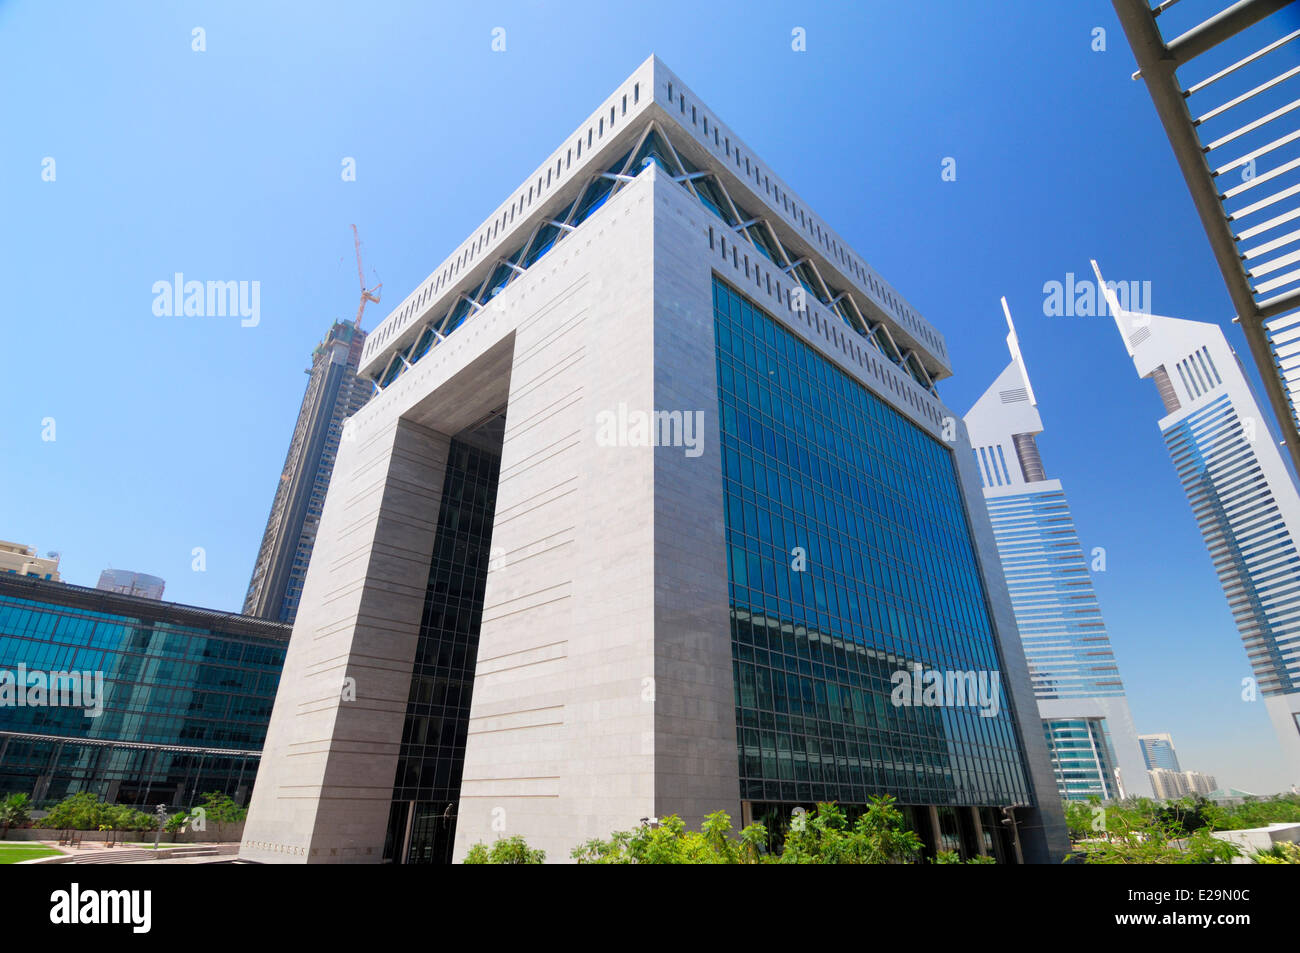 United Arab Emirates, Dubai emirate, Dubai's World Trade Center business district, The Gate Building by Gensler - Stock Image